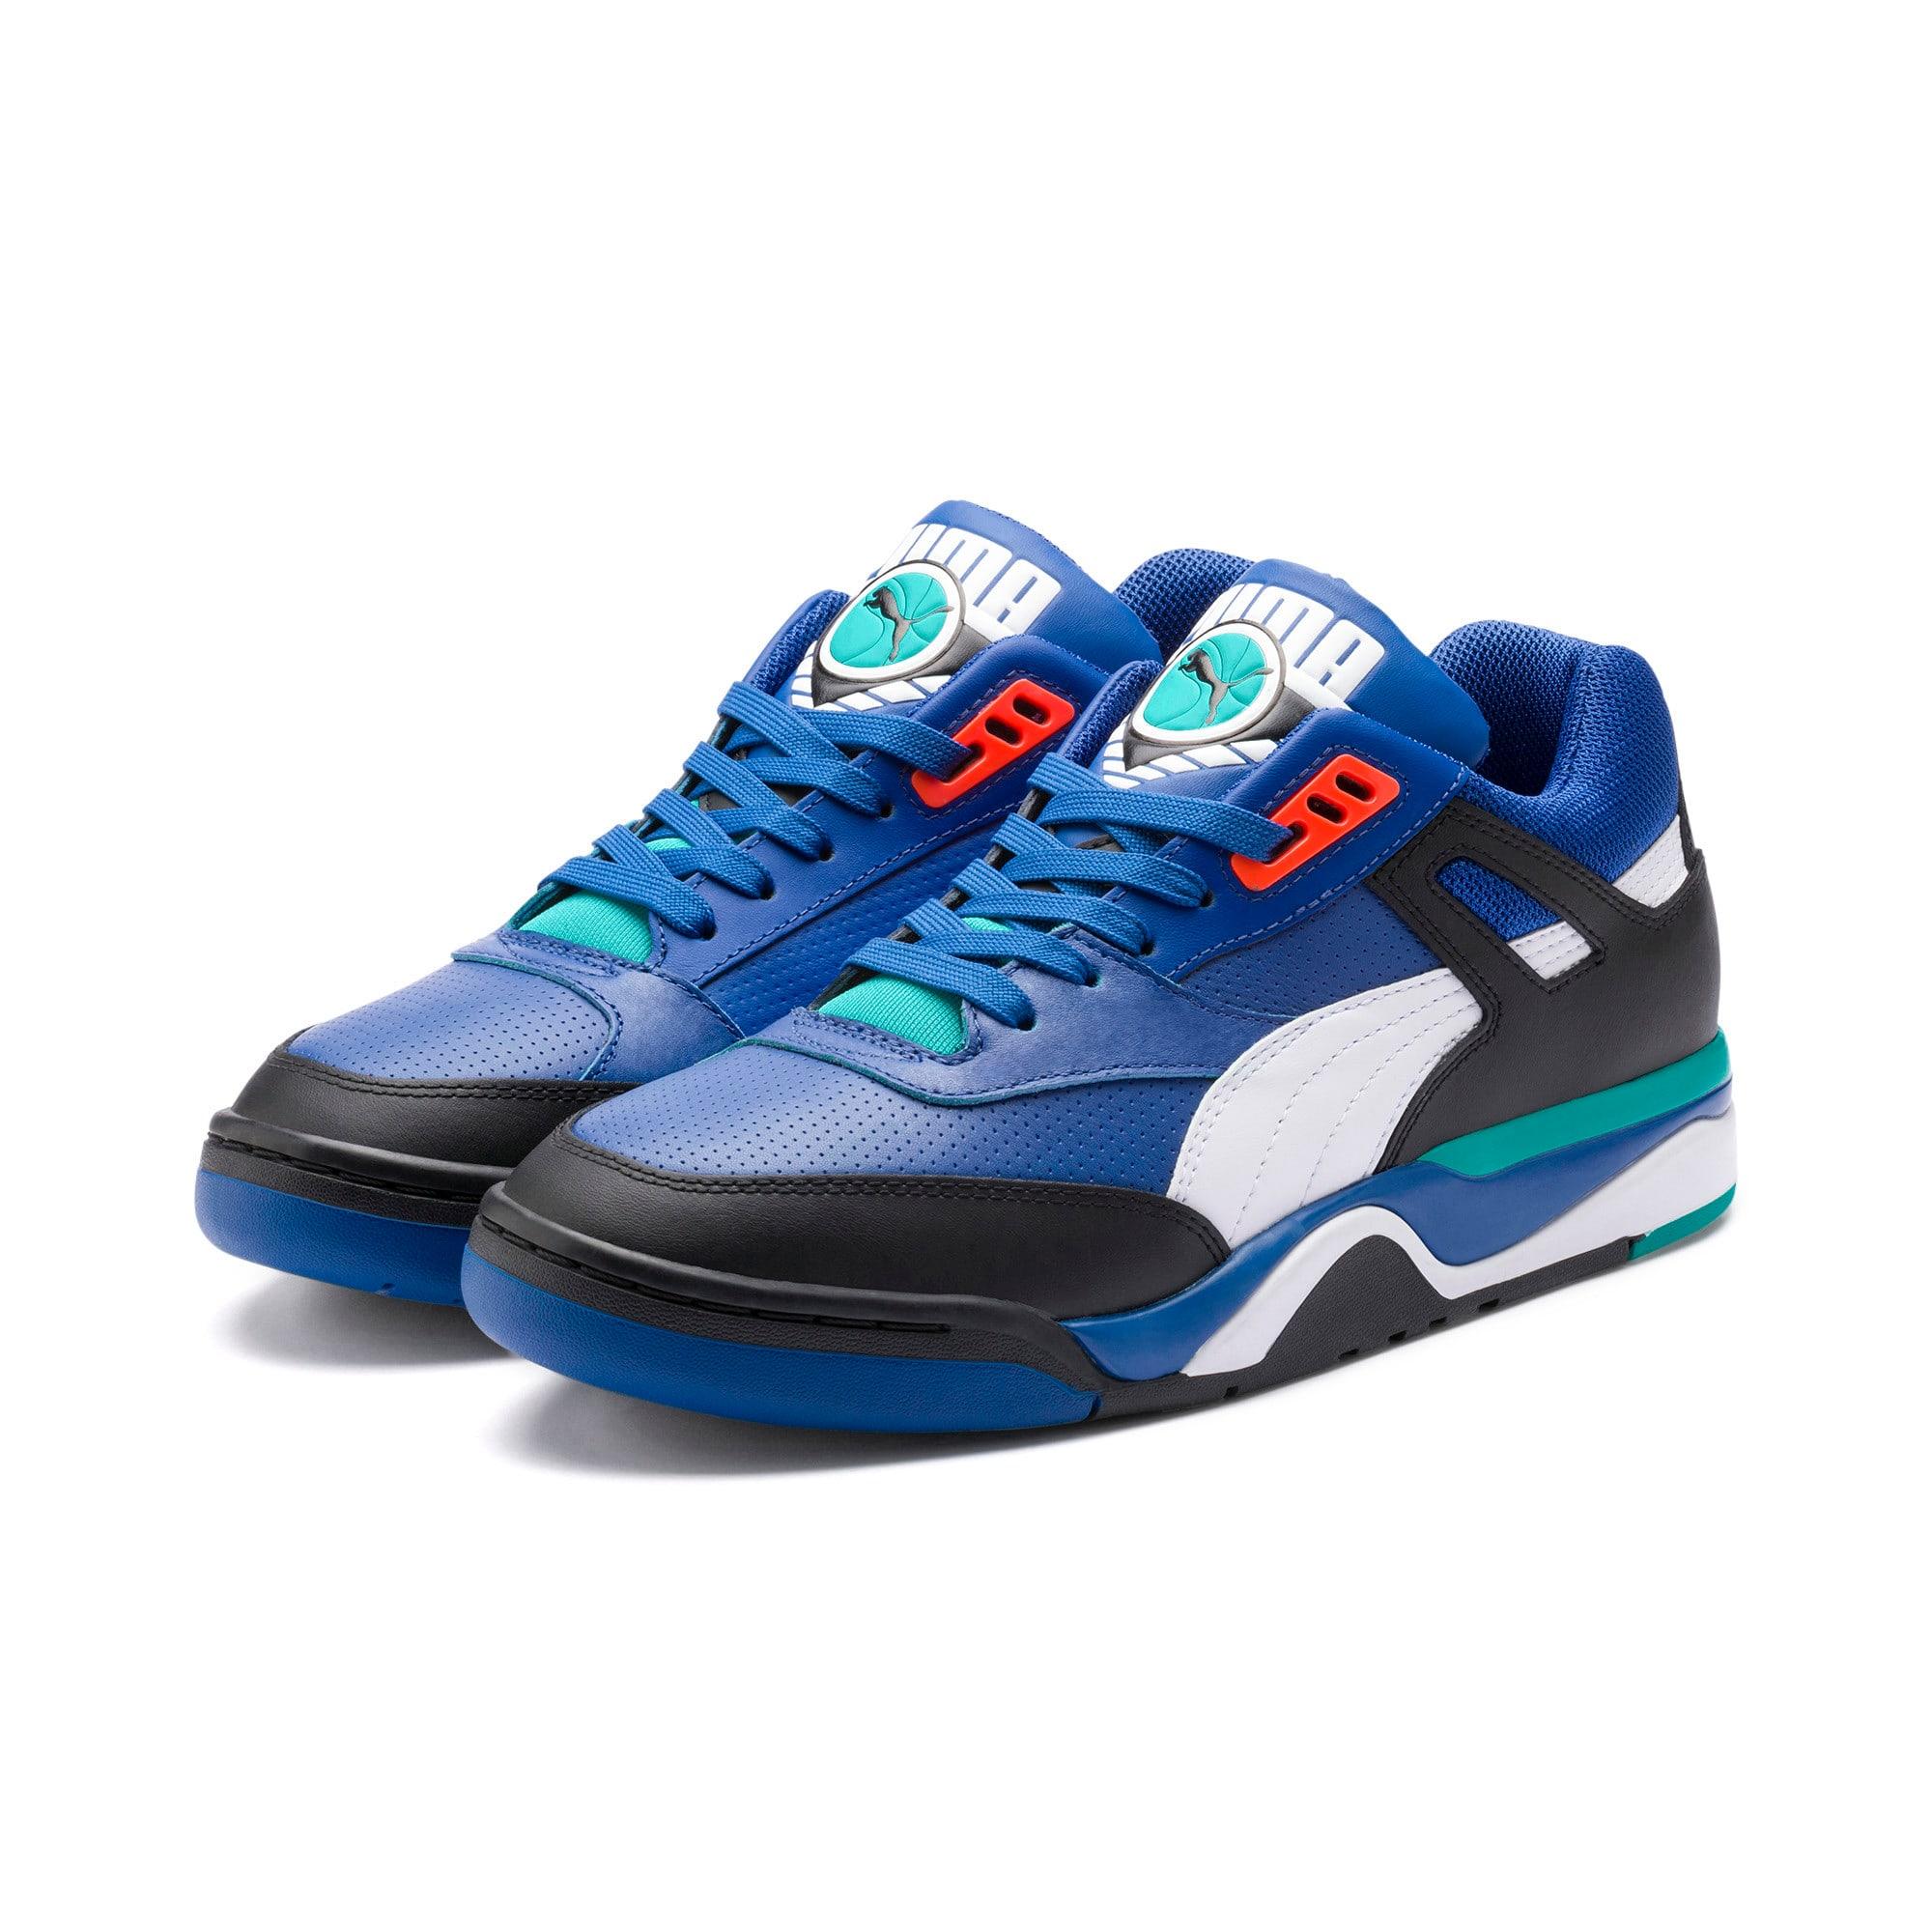 Thumbnail 2 of Palace Guard Sneakers, Puma Black-Puma White-Blue, medium